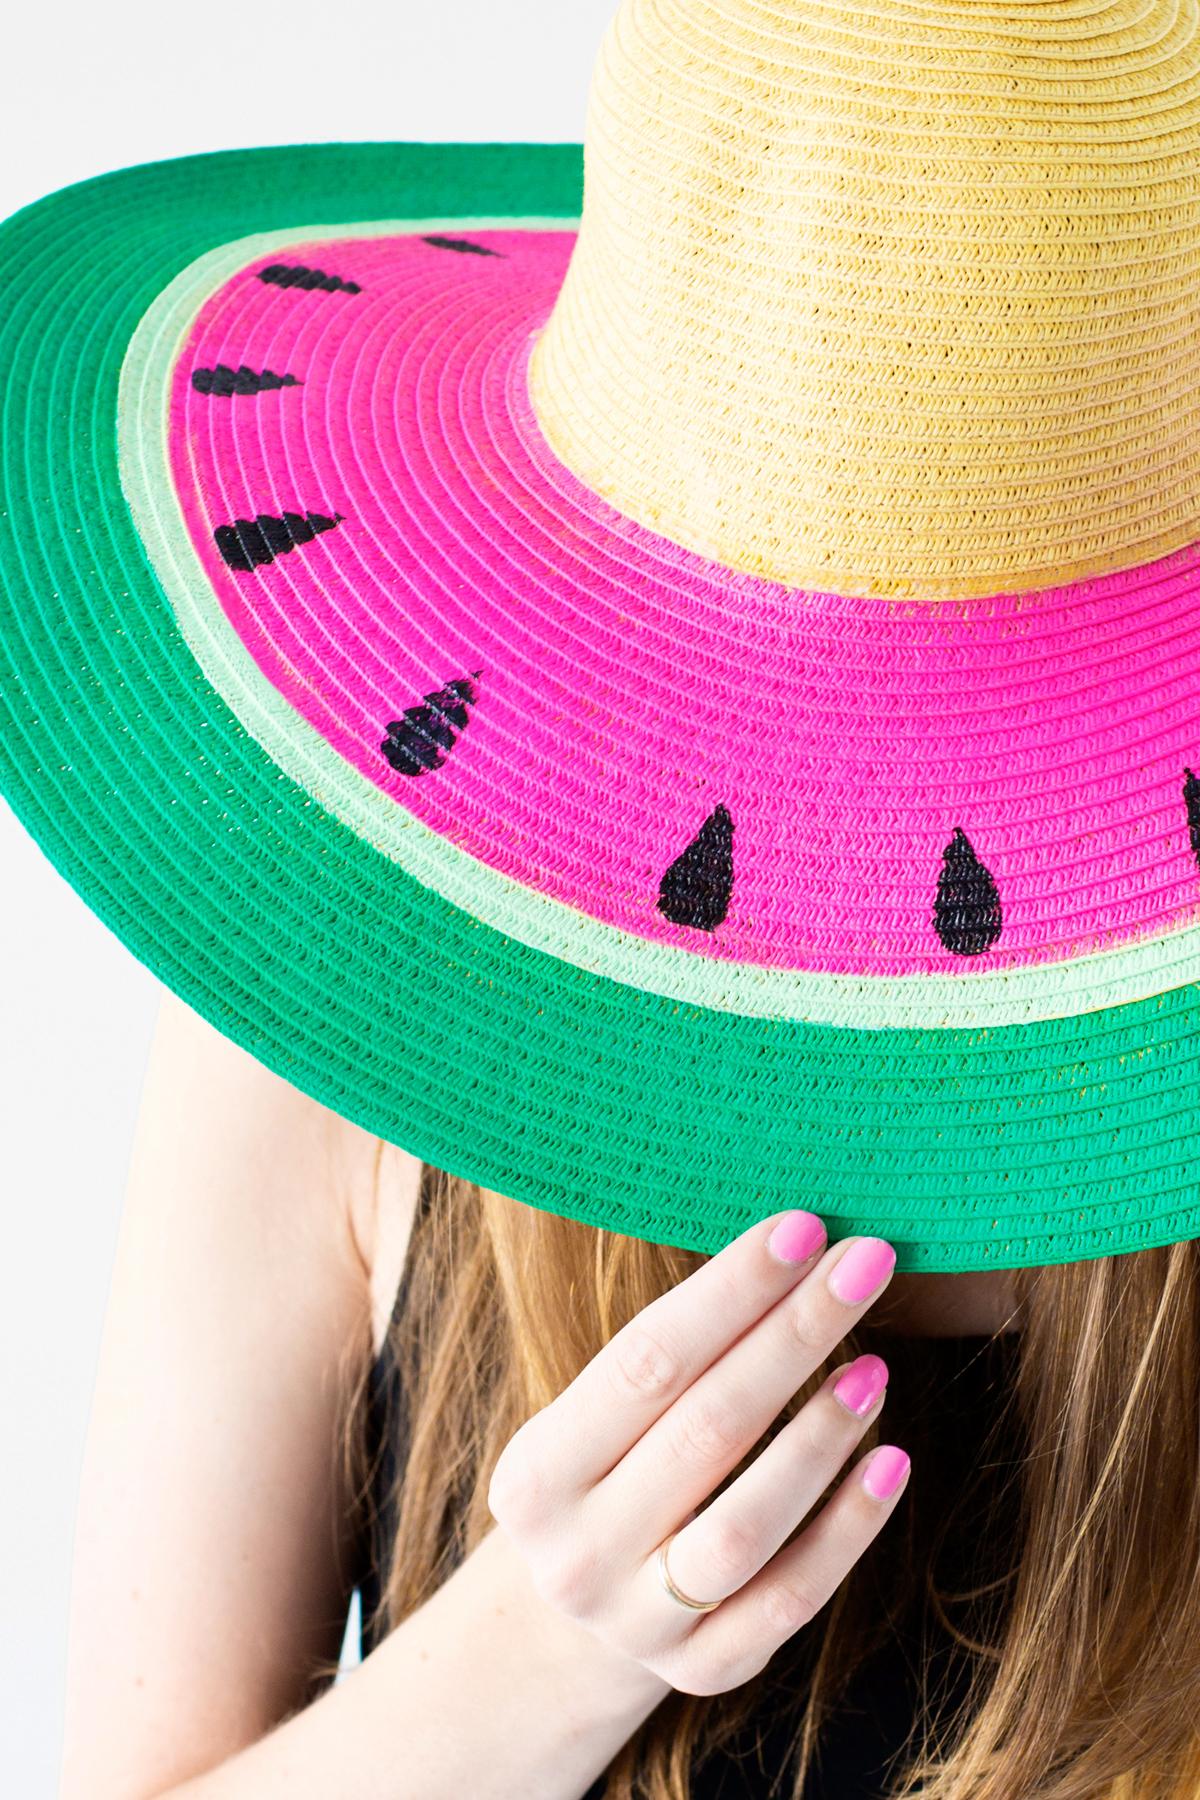 Diy watermelon floppy hat studio diy for Diy pictures